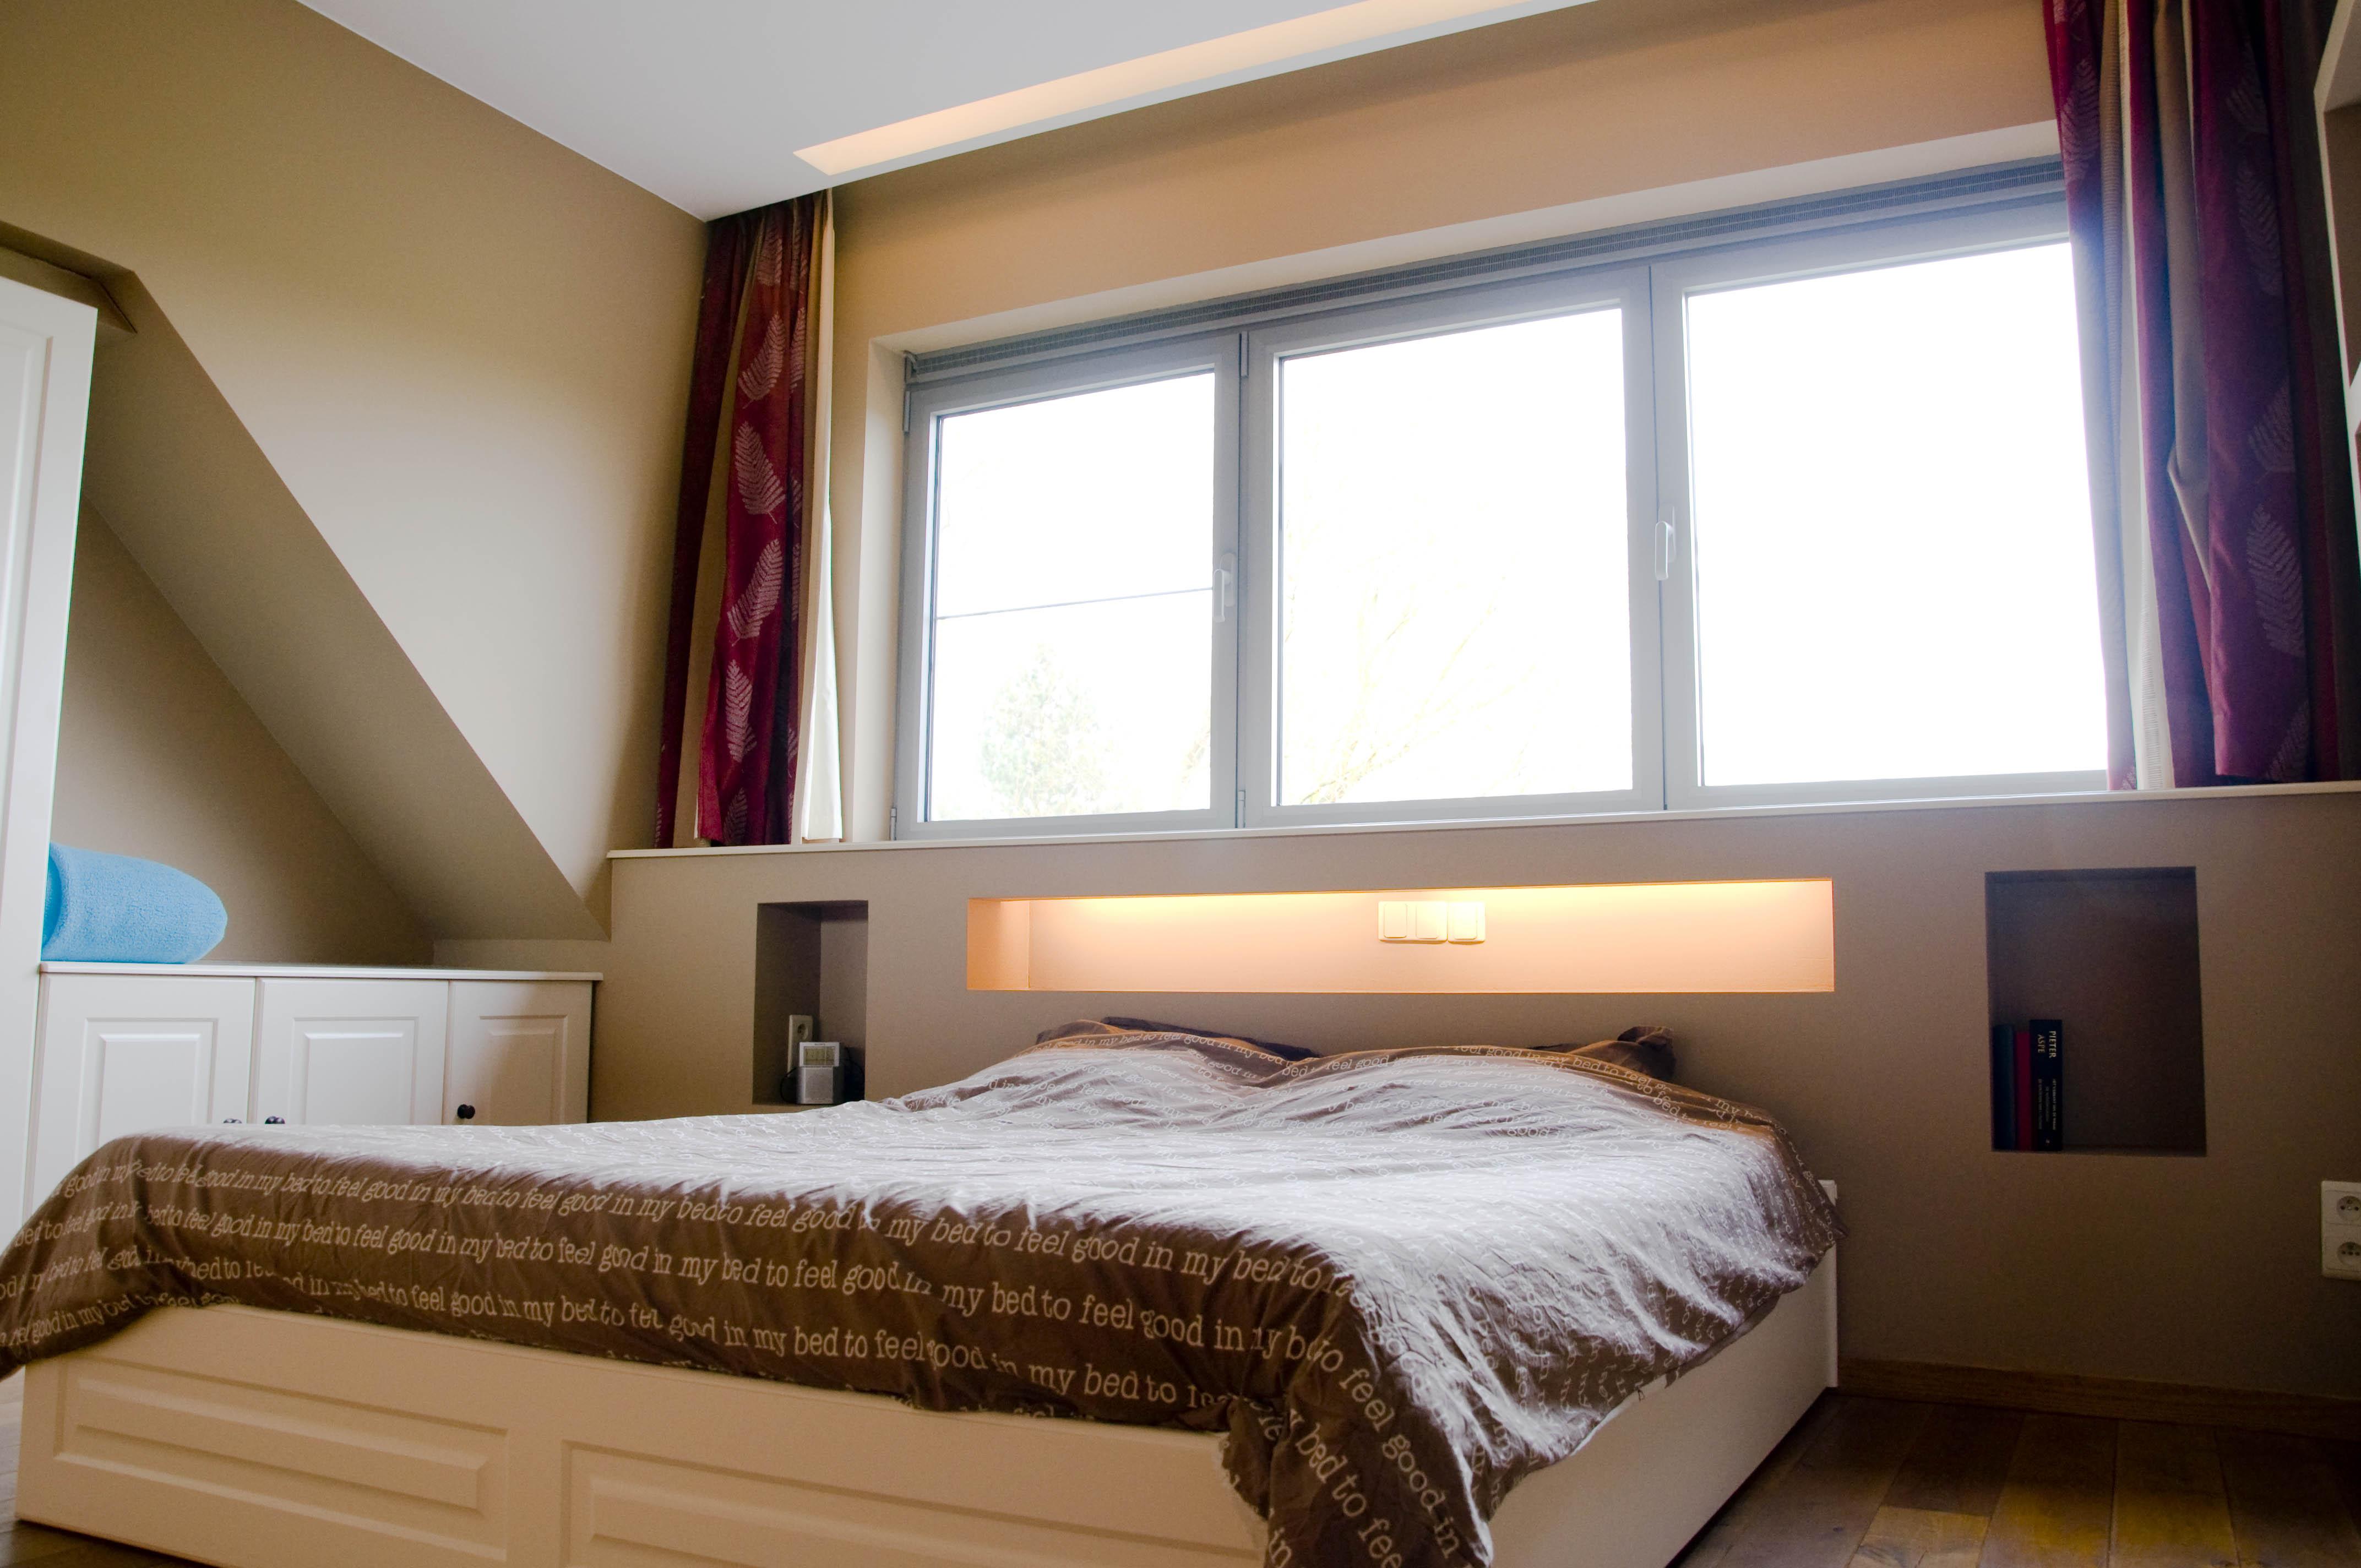 Lamp Slaapkamer Nachtkastje : Artigyp slaapkamer in privé woning duffel